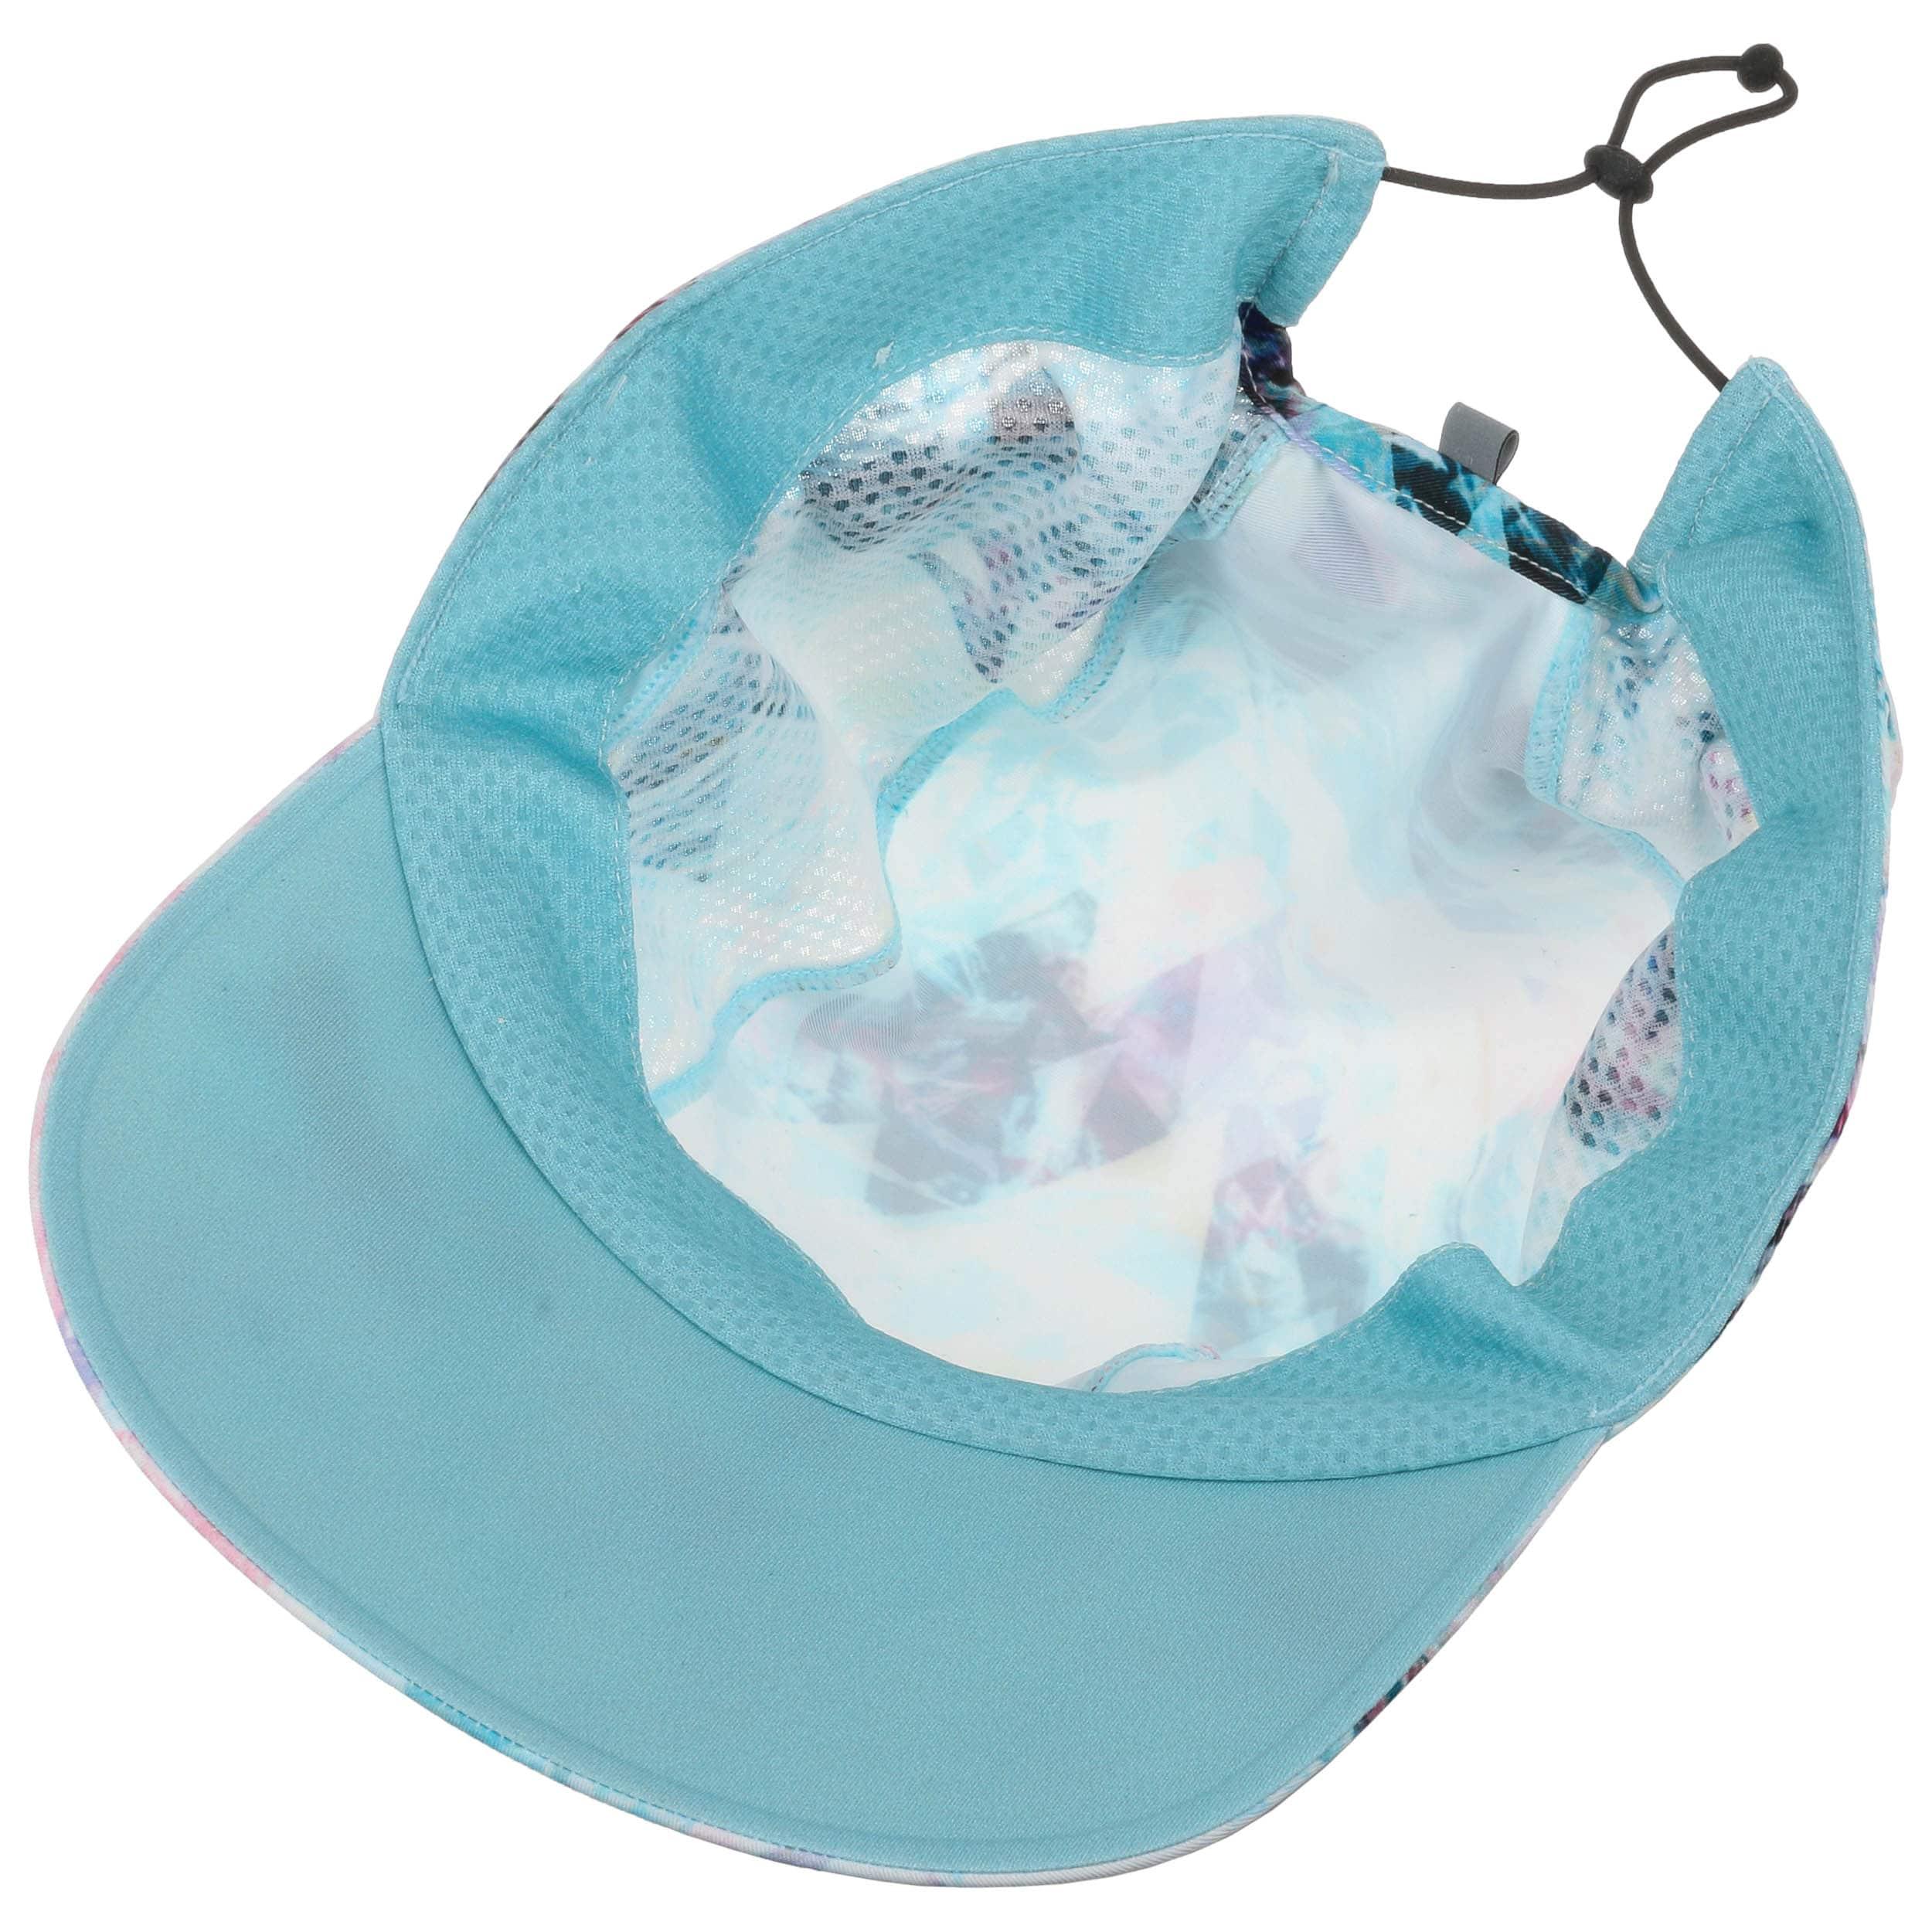 ... R-Irised Aqua Pack Run Cap by BUFF - türkis 2 ... 835e8ad38f